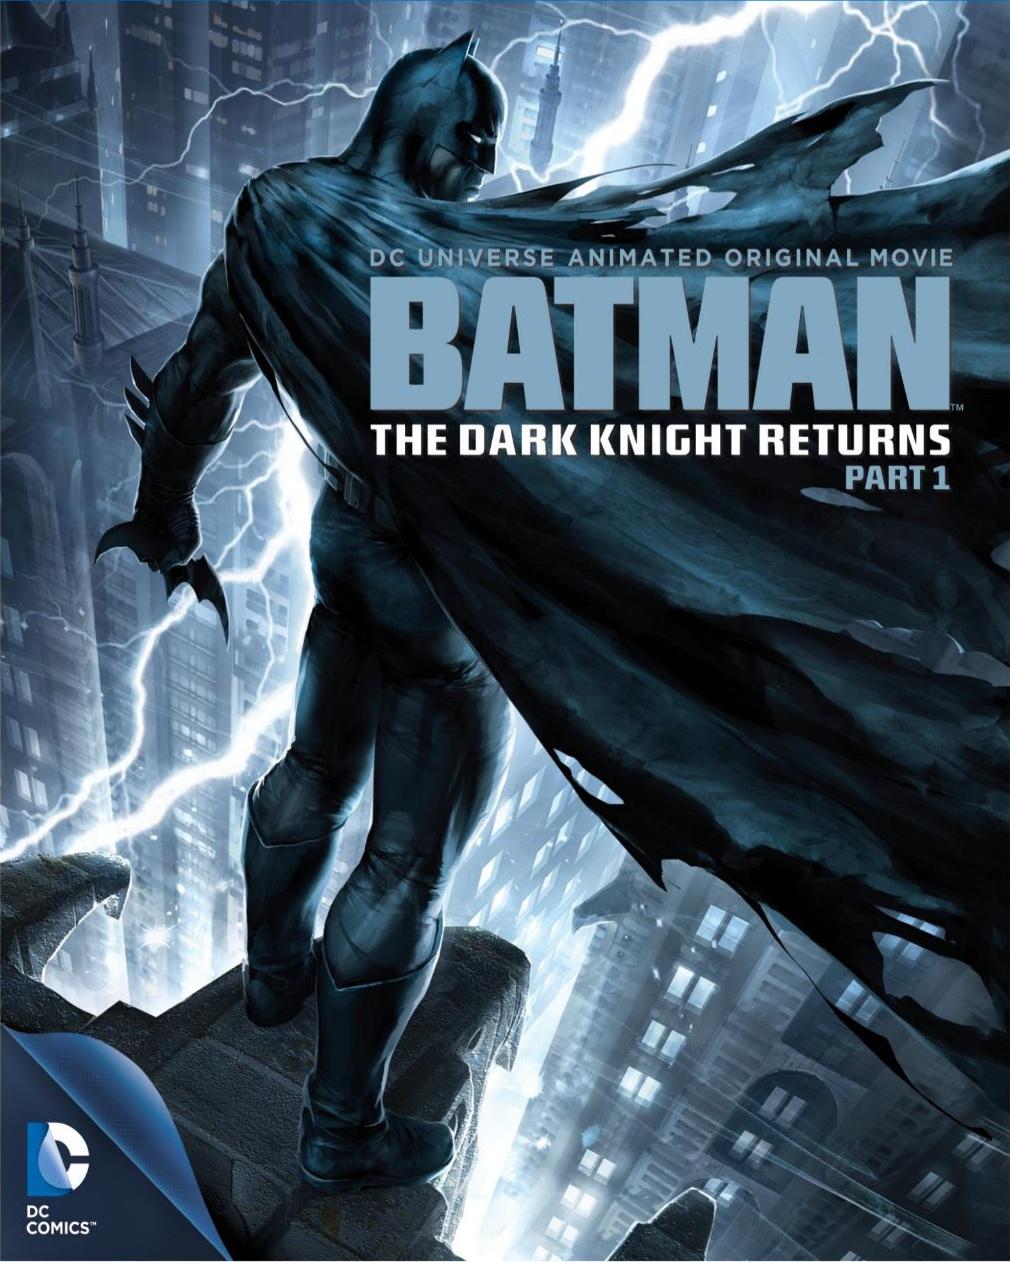 Batman: The Dark Knight Returns, Part 1 (Animated)